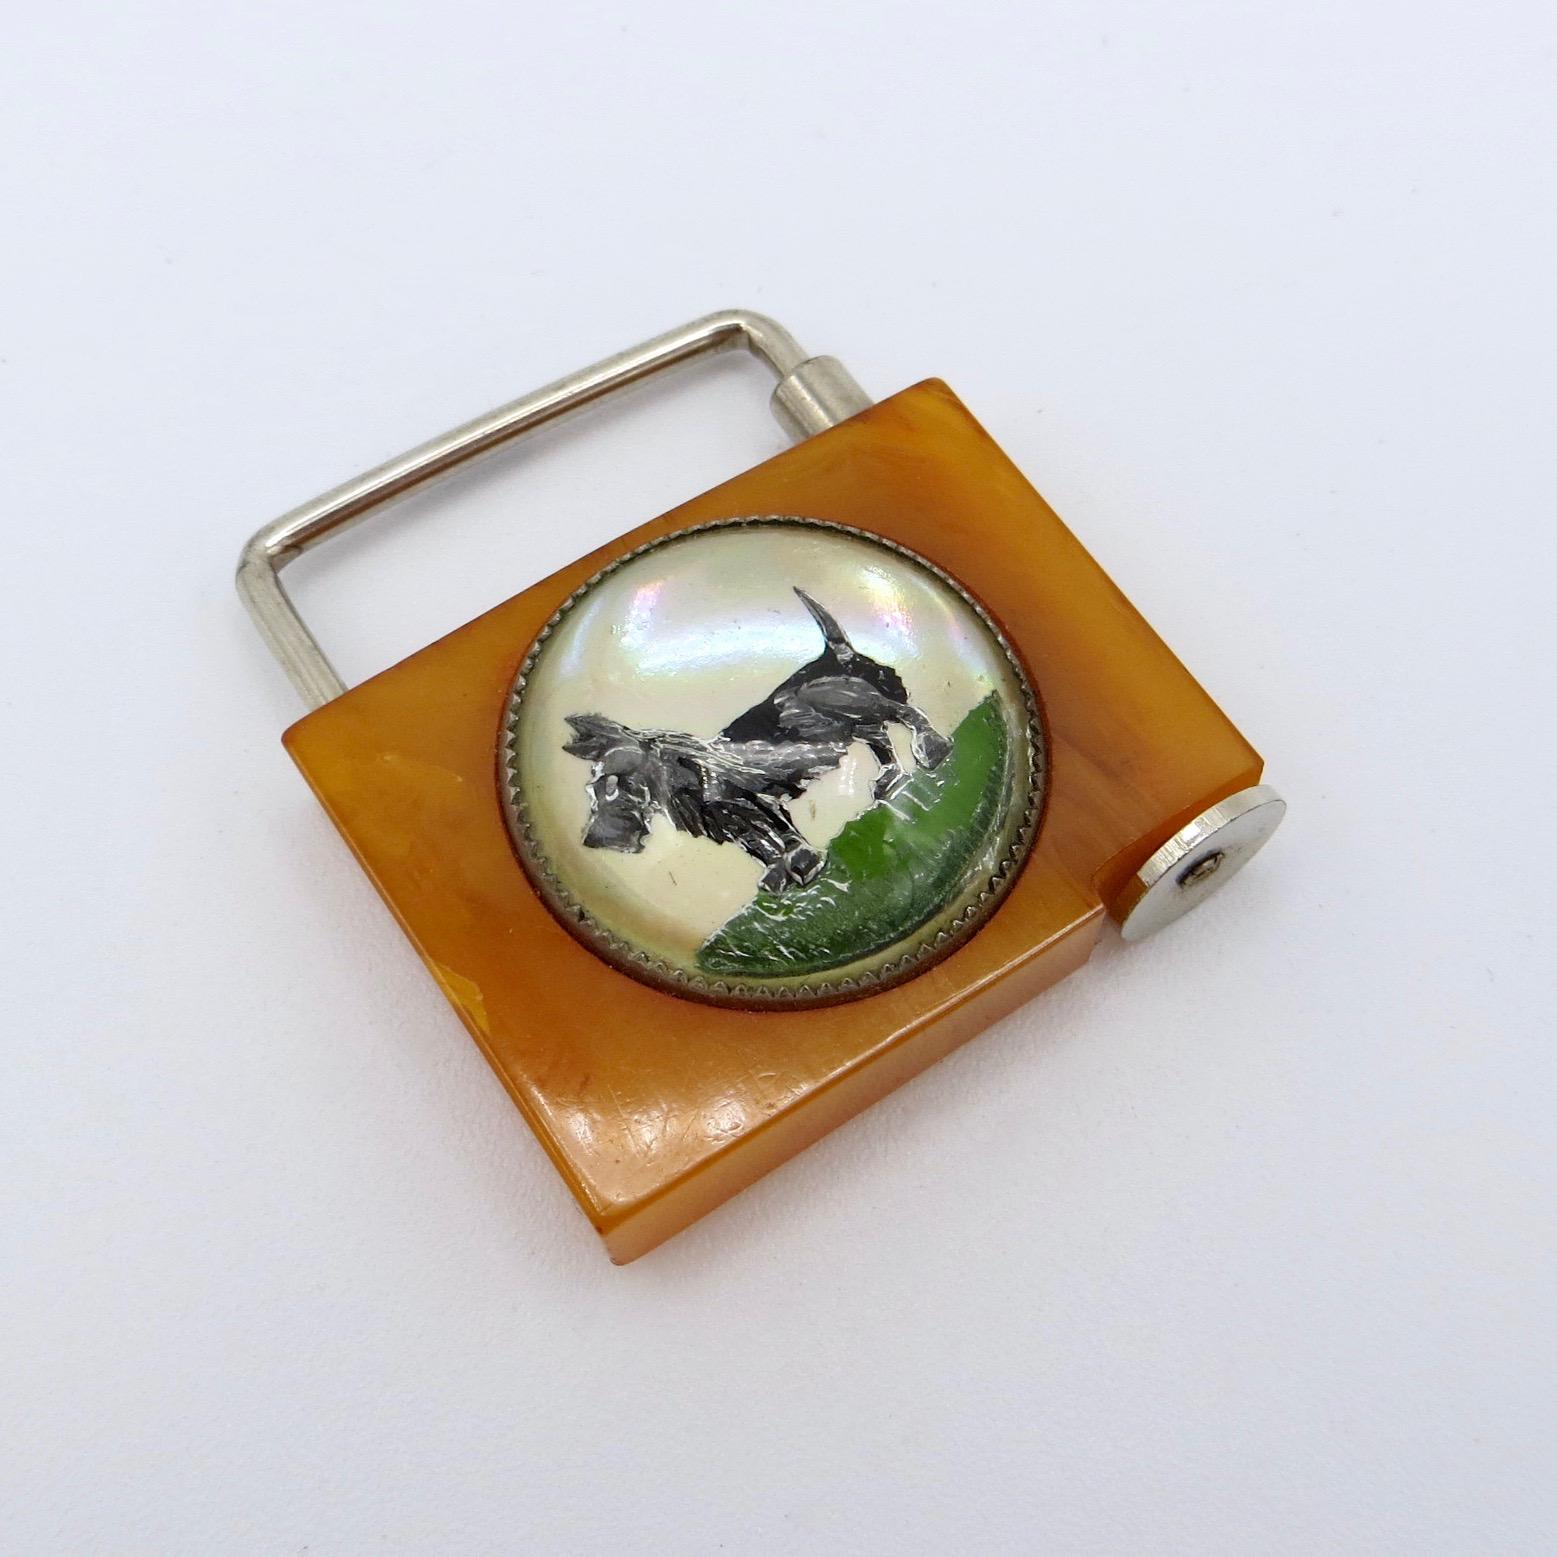 Bakelite Lock/Keychain